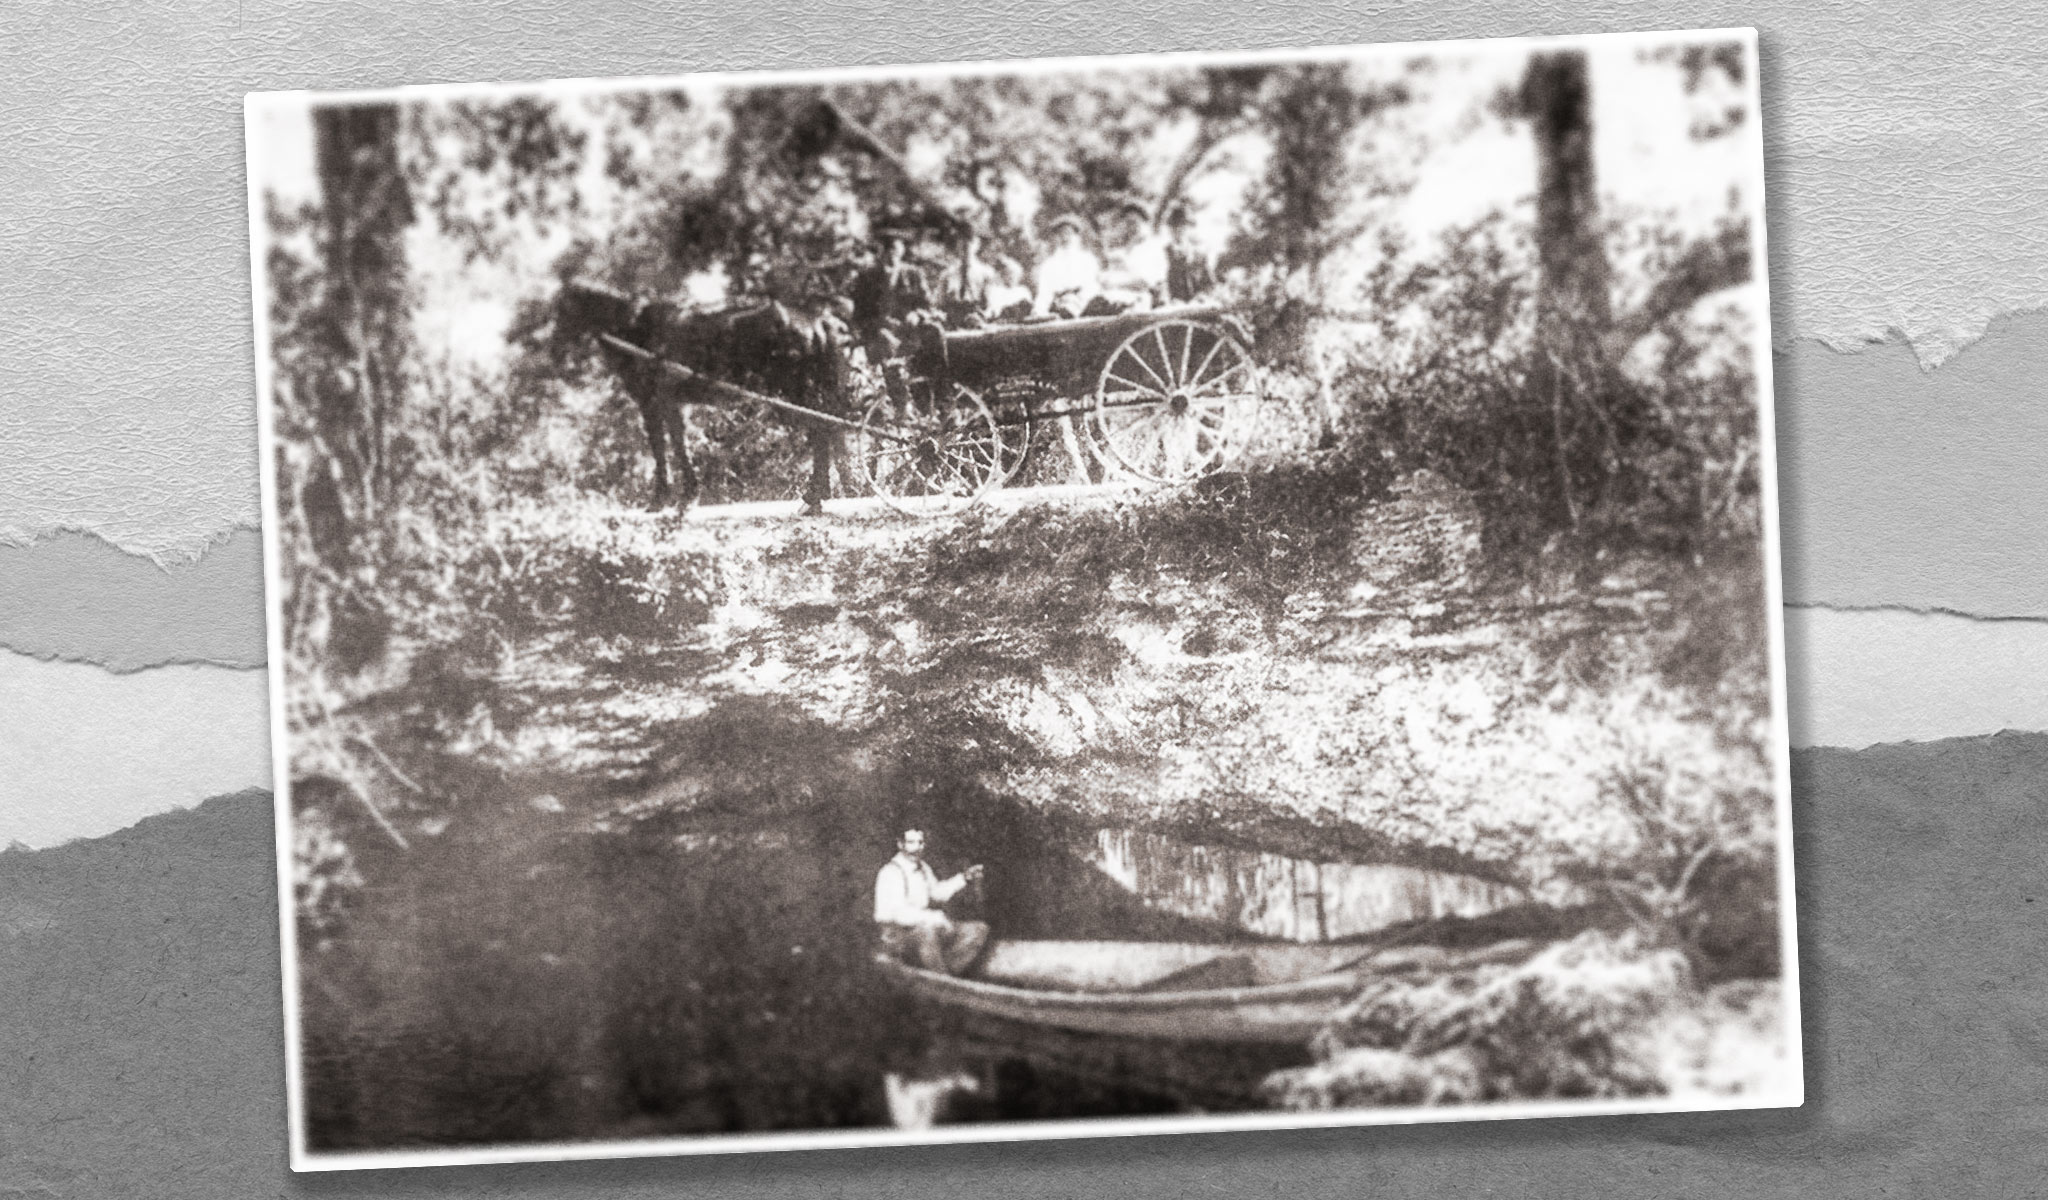 Arch Creek Scapbook photo